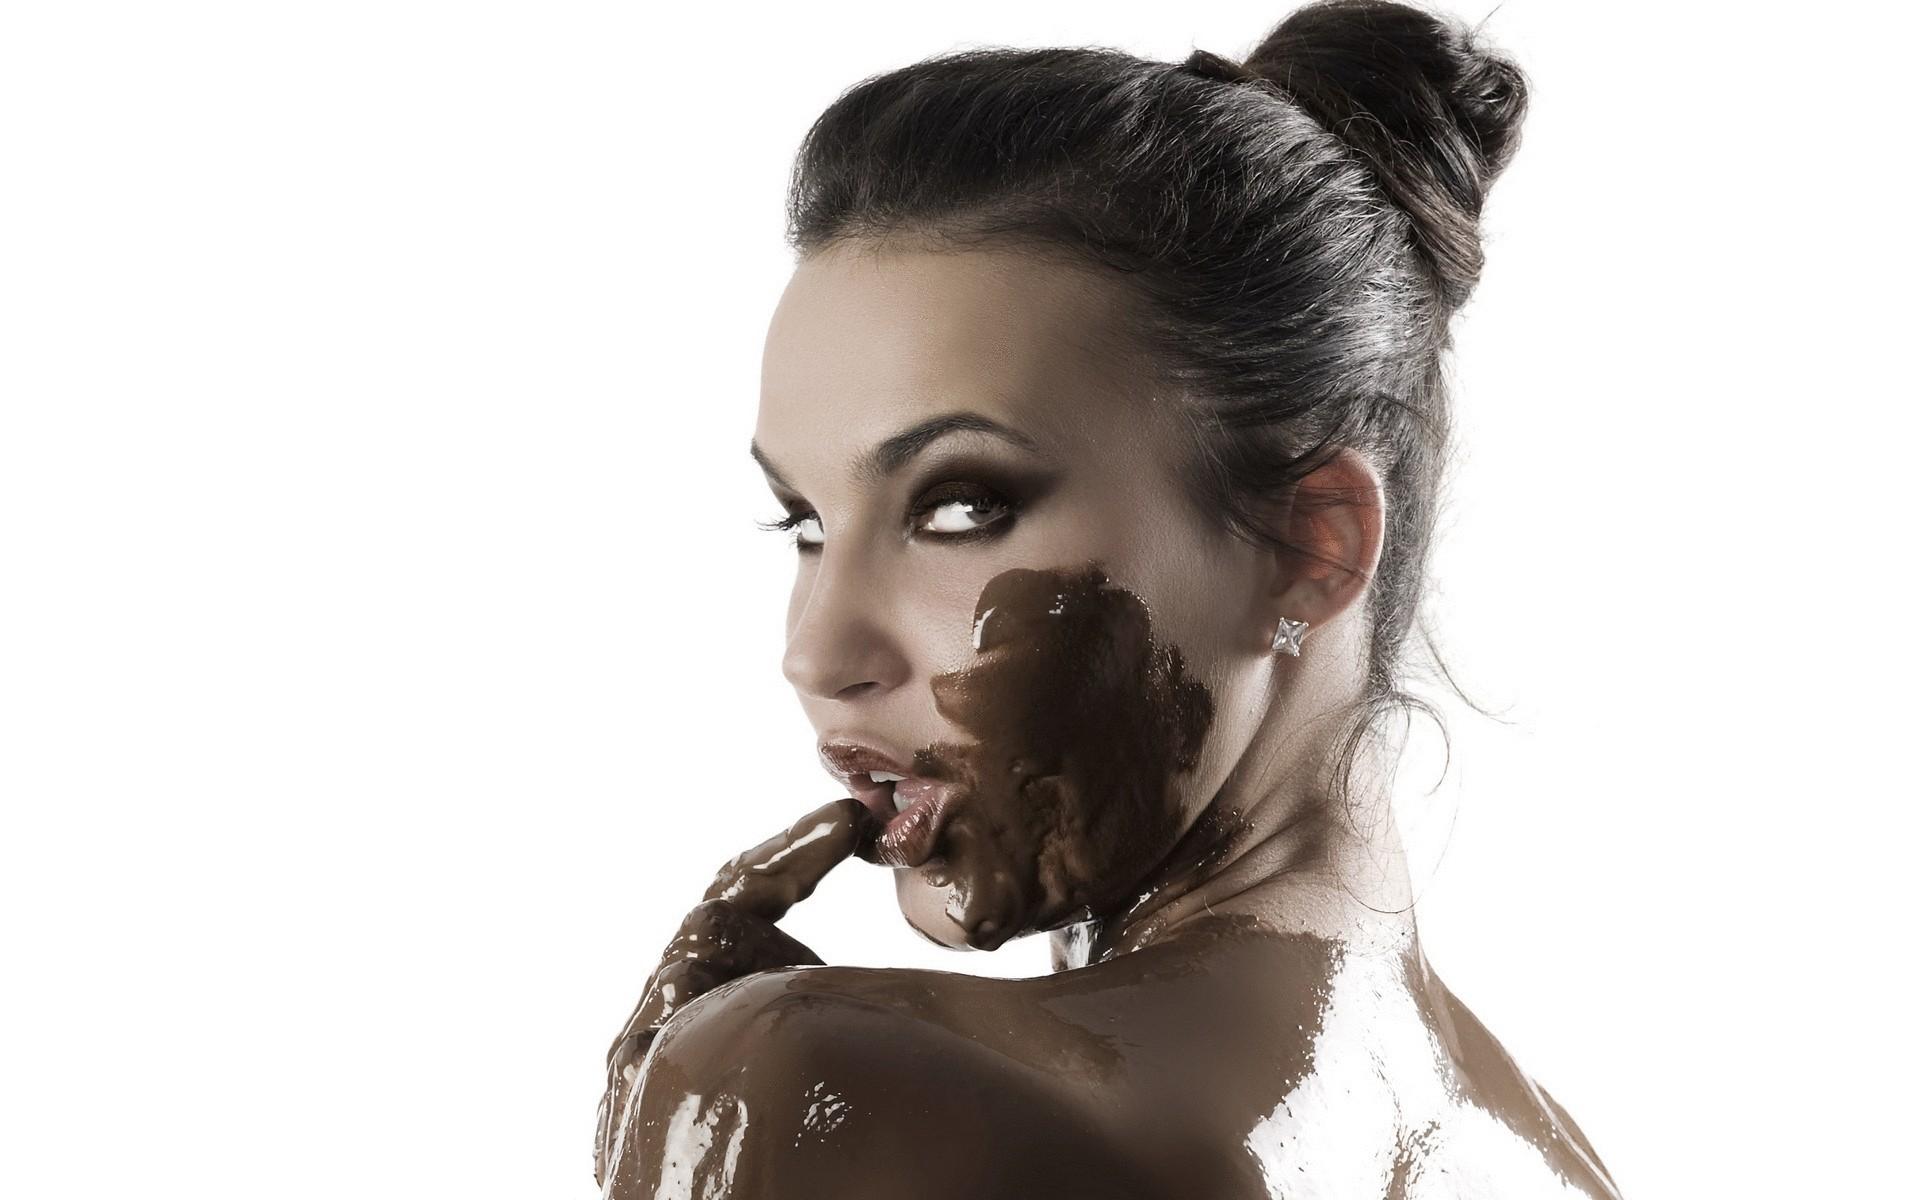 имени девушки в шоколаде откуда возьмись